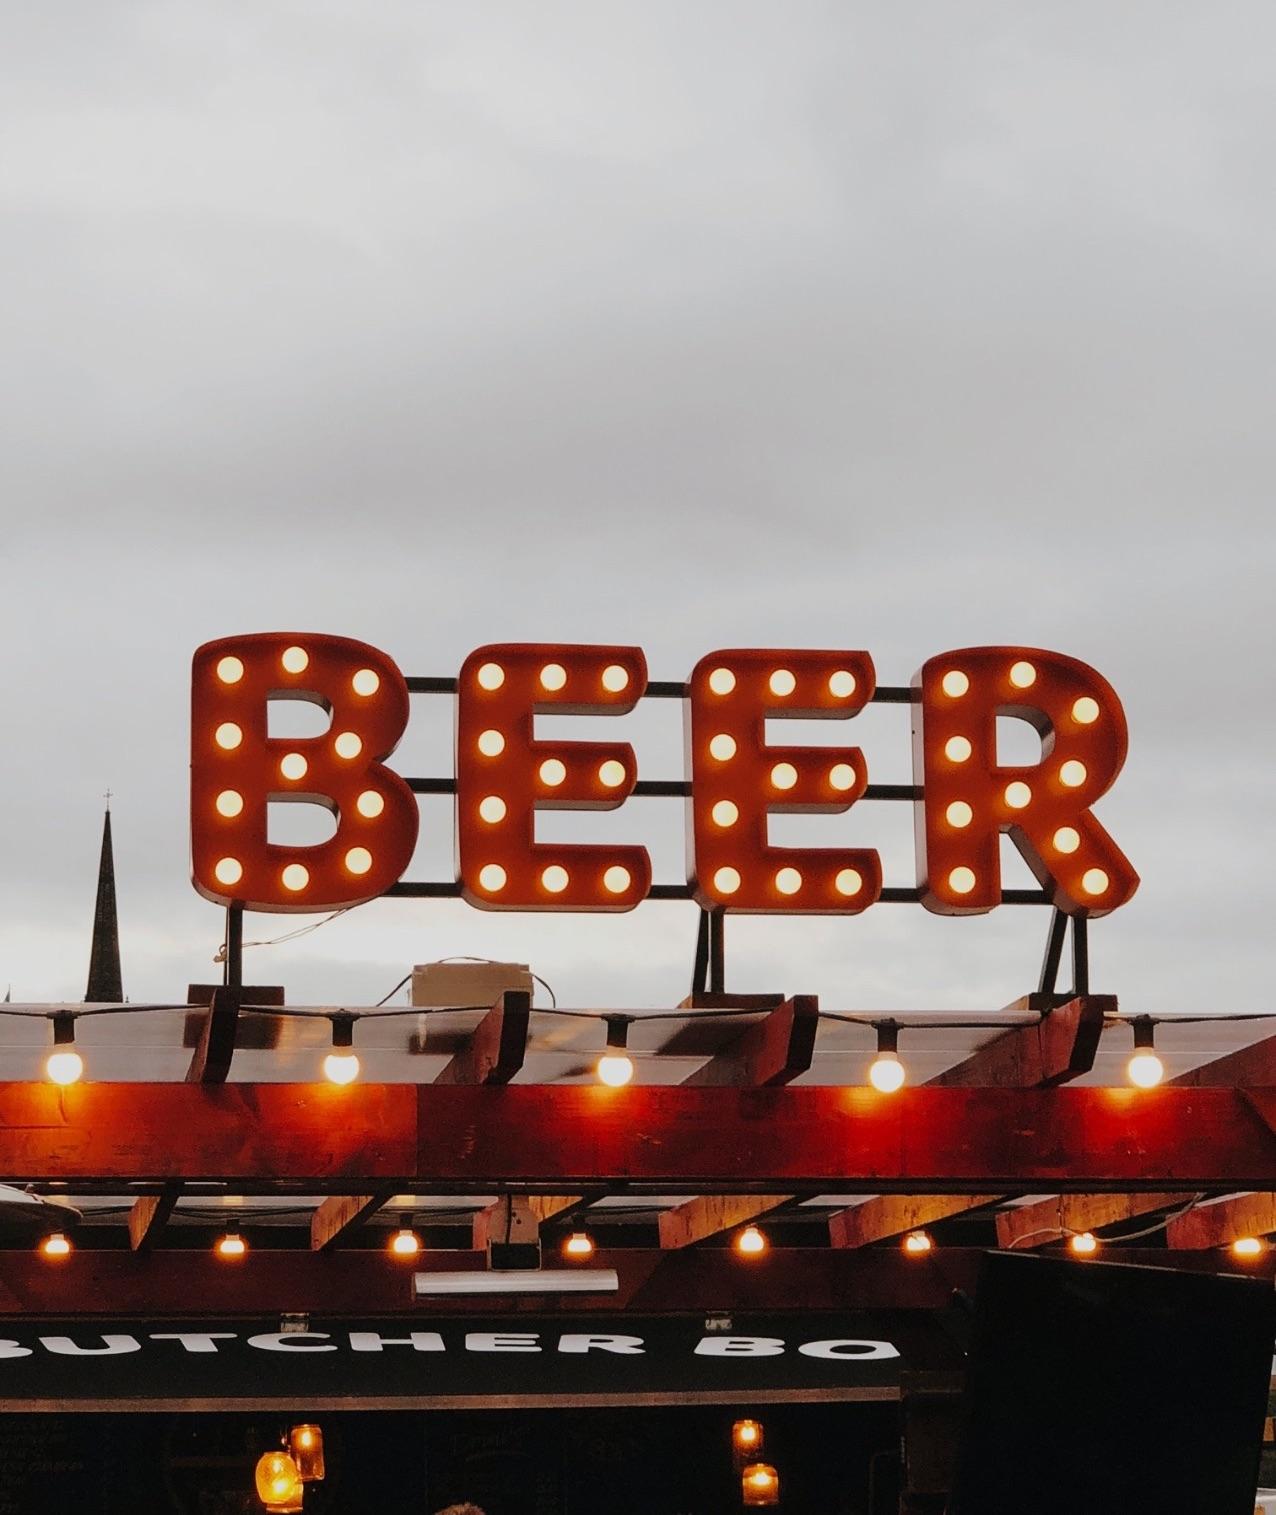 produzione-birra-storia-stili